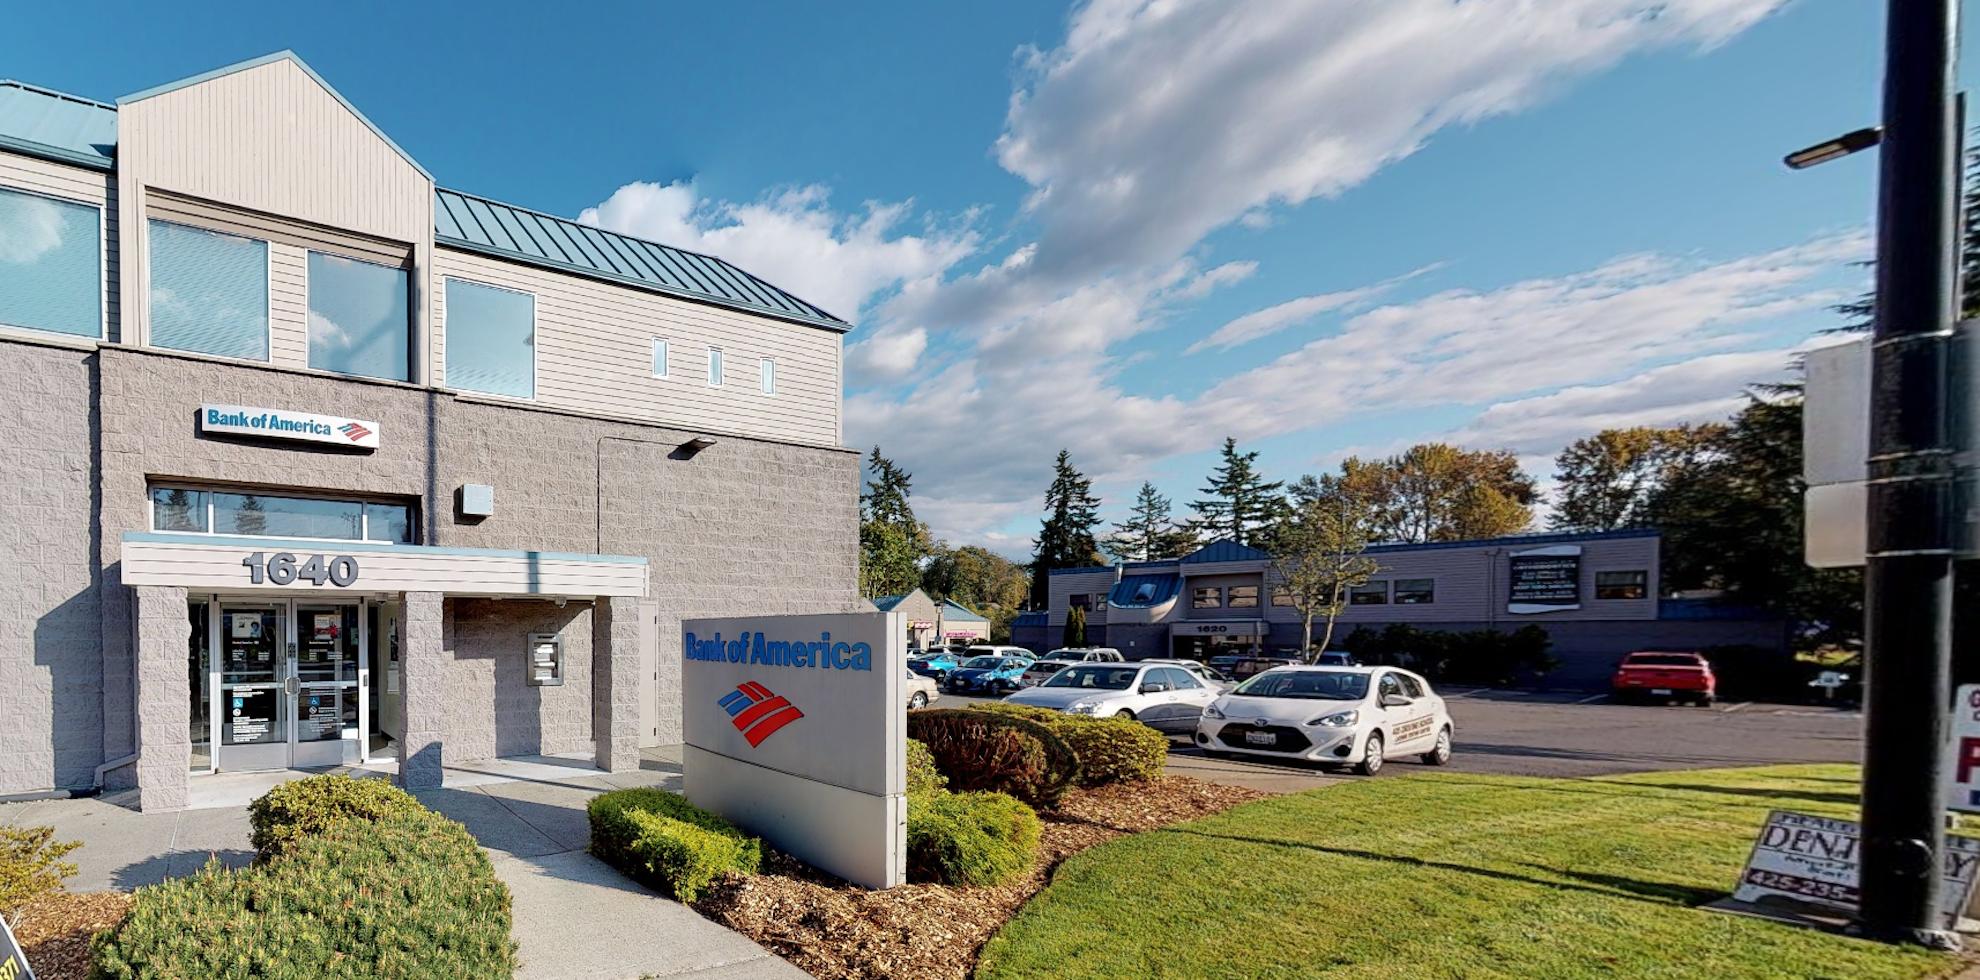 Bank of America financial center with drive-thru ATM | 1640 Duvall Ave NE, Renton, WA 98059